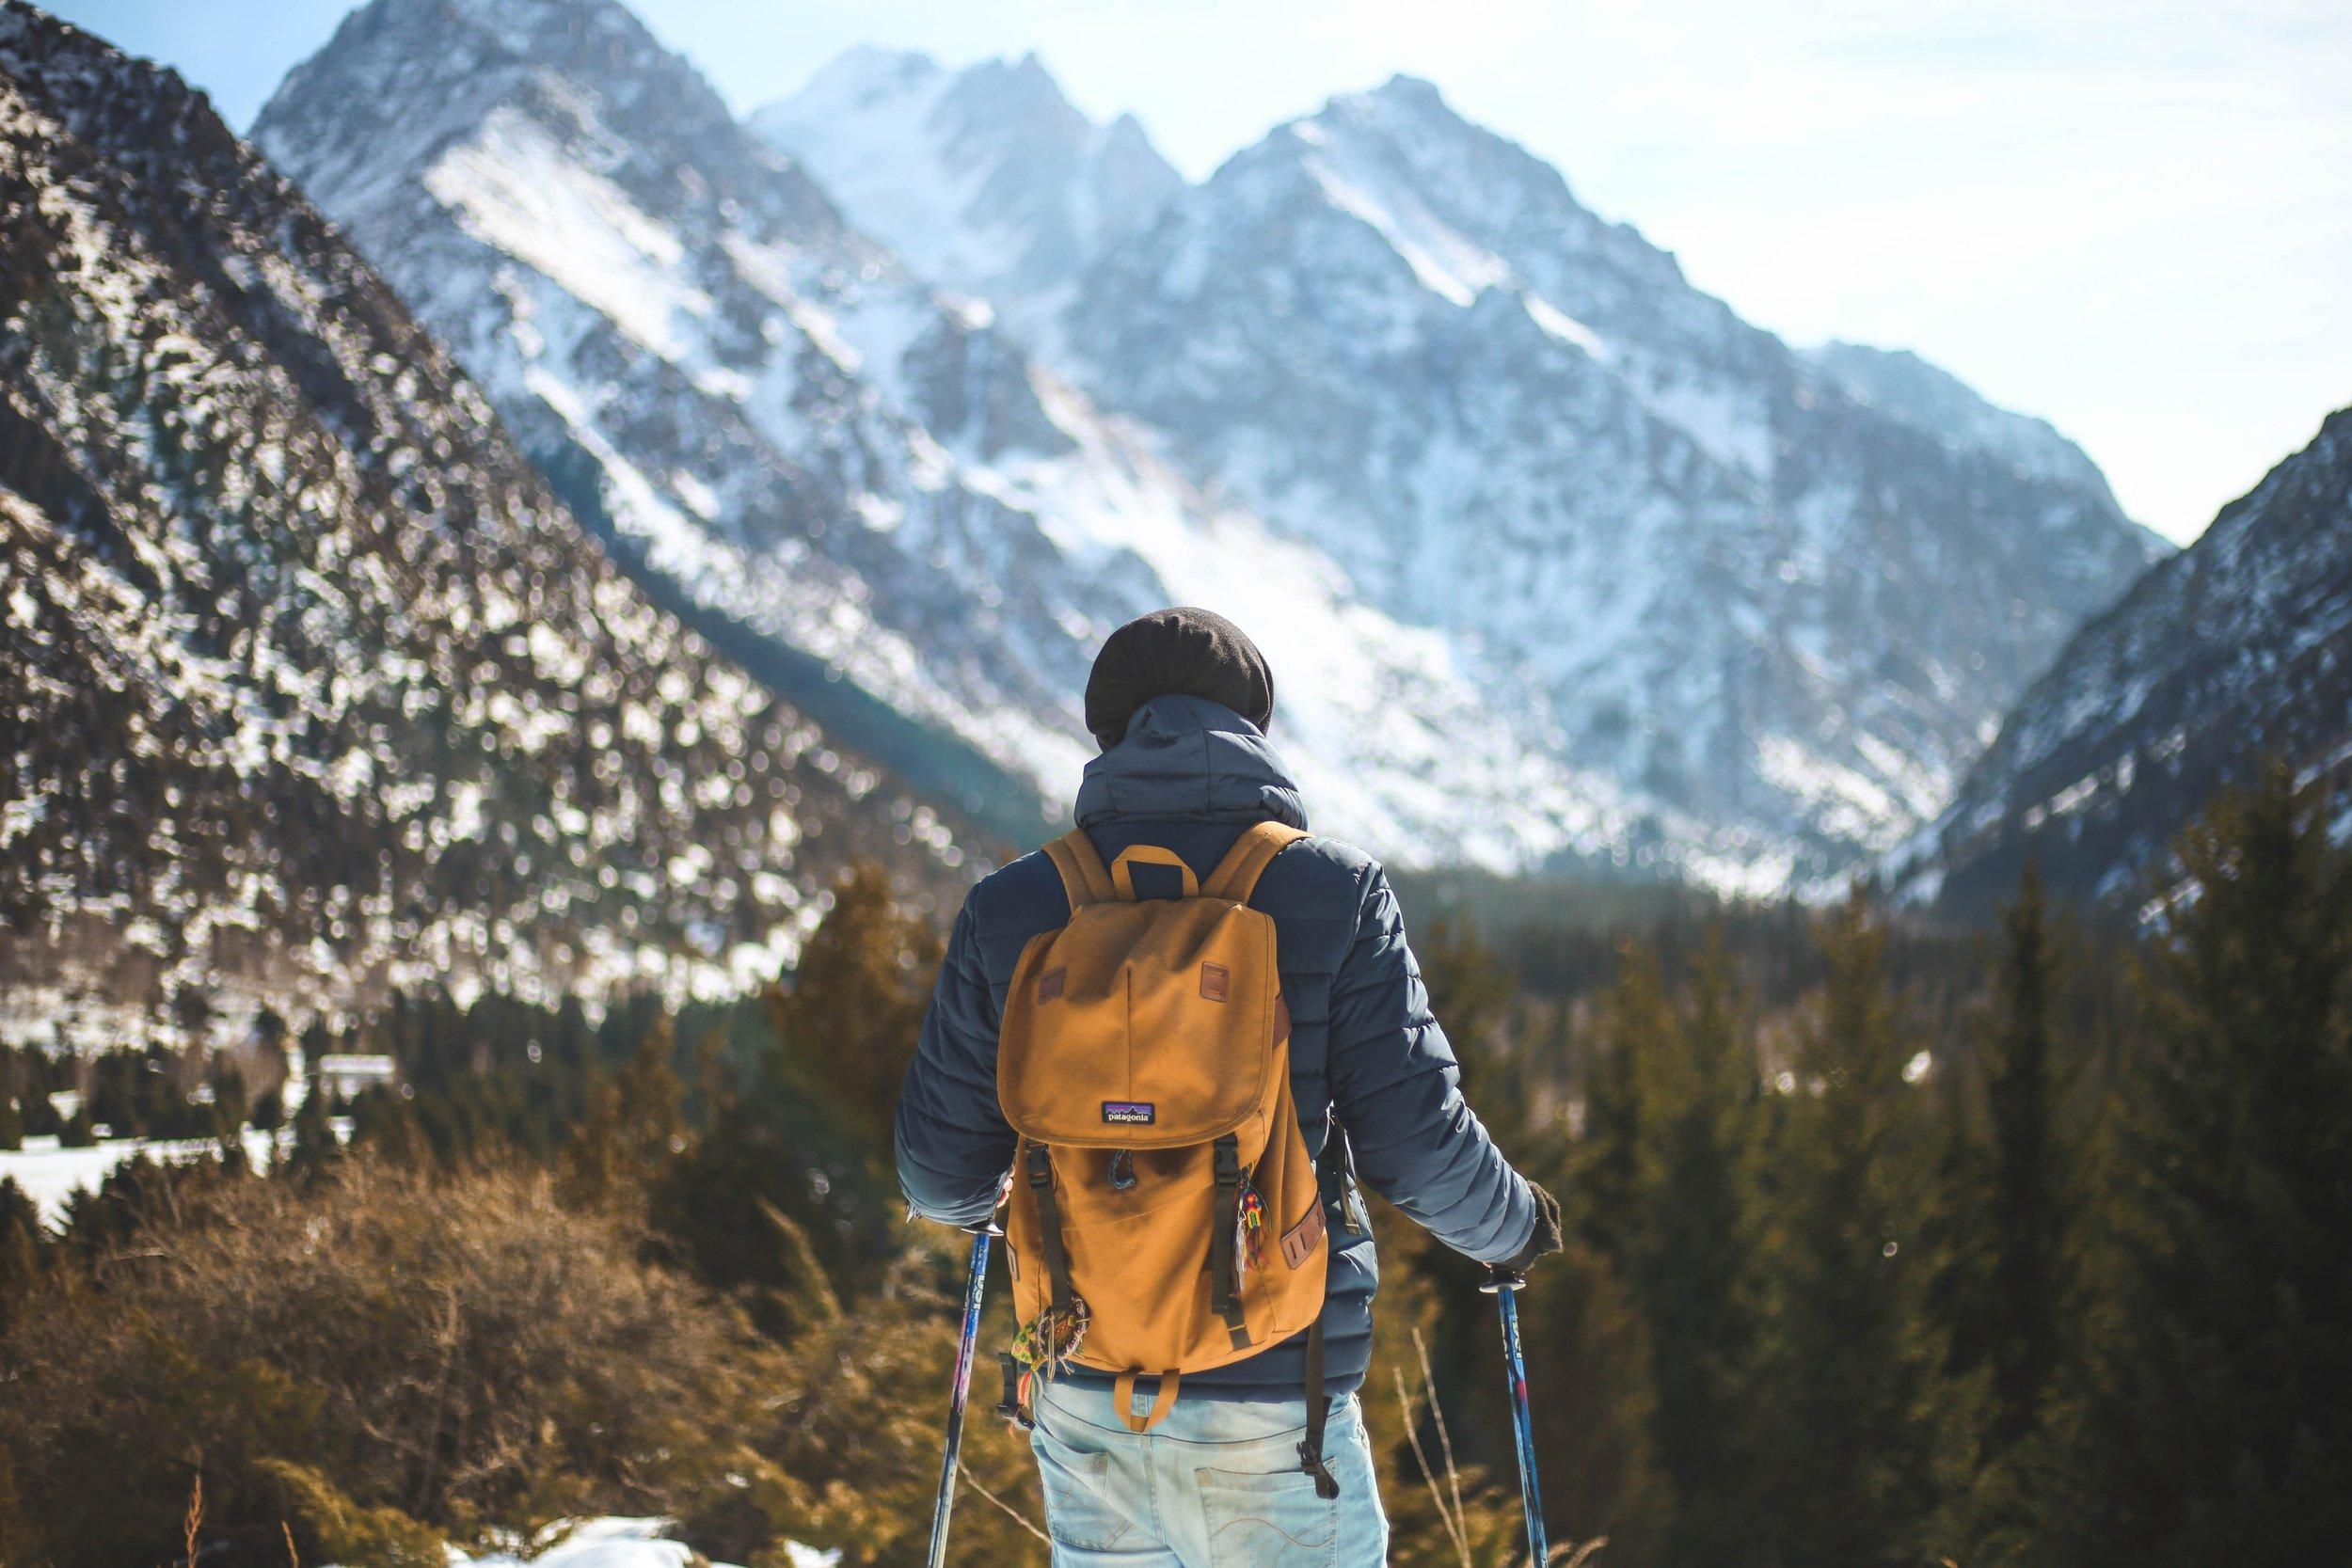 adventure-backpack-blue-mountains-868097.jpg